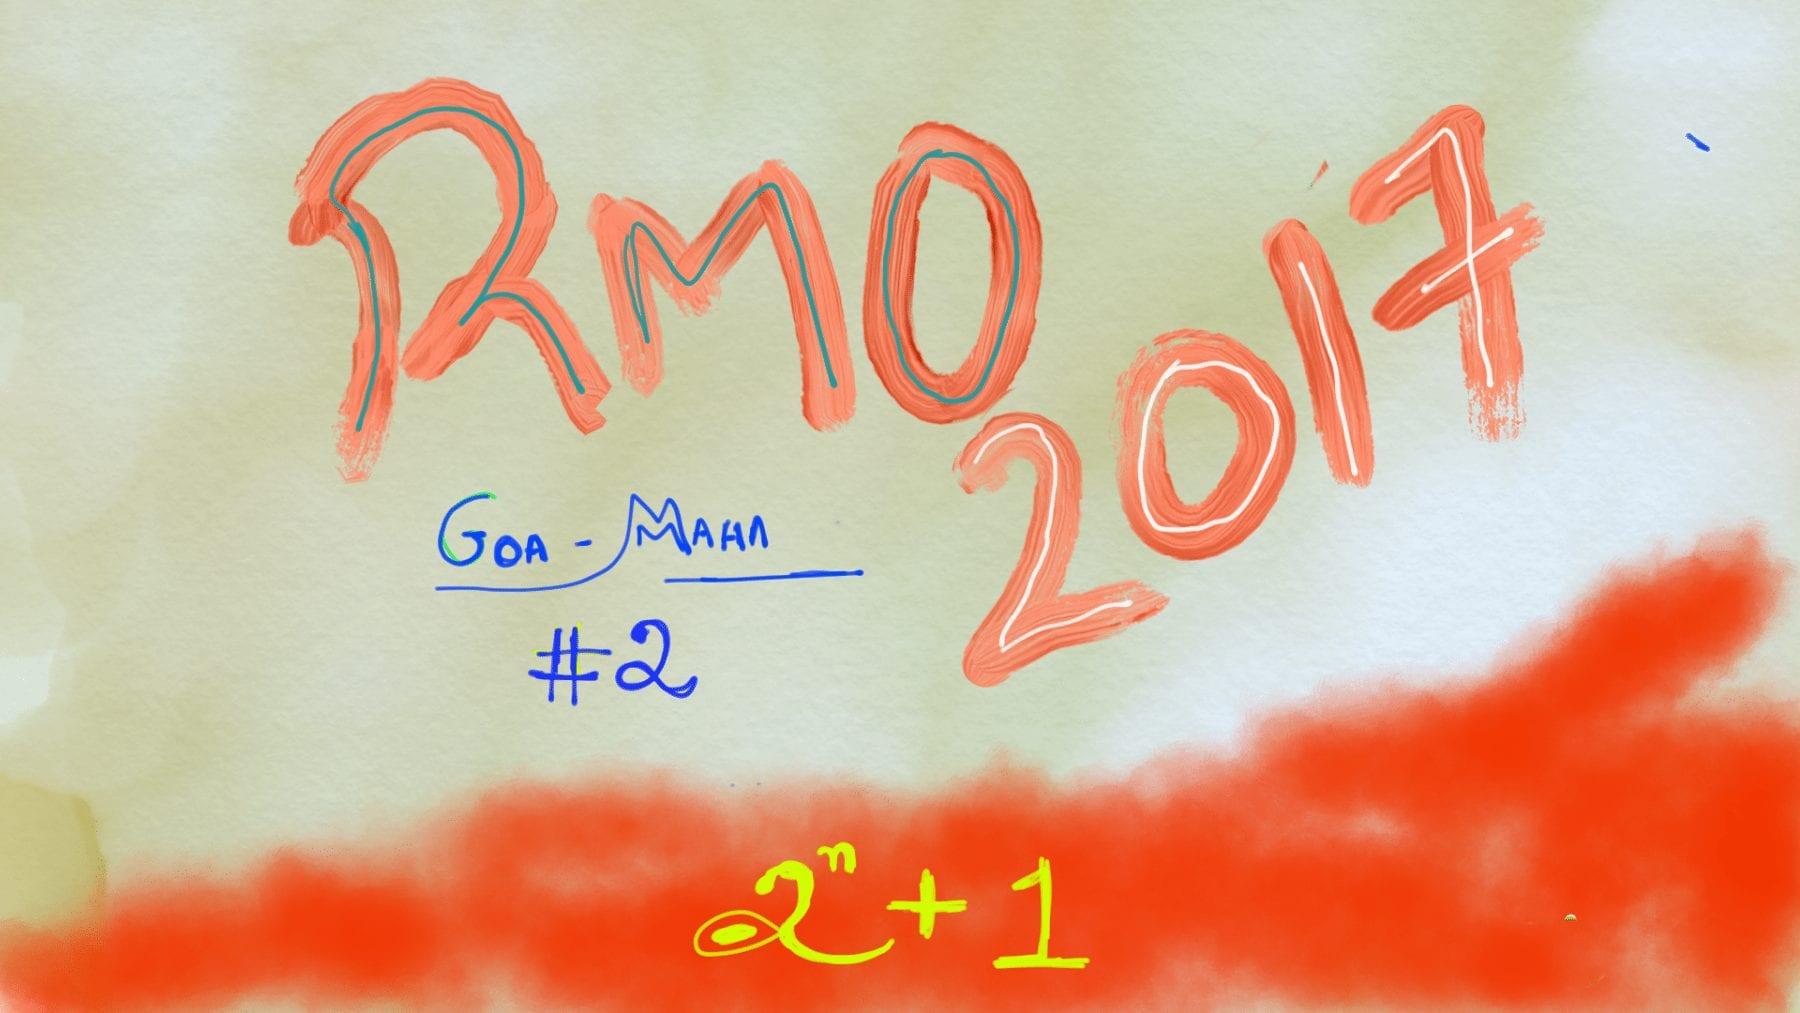 Almost Mersenne Primes (RMO 2017 Problem 2 India Goa Region Part 1)